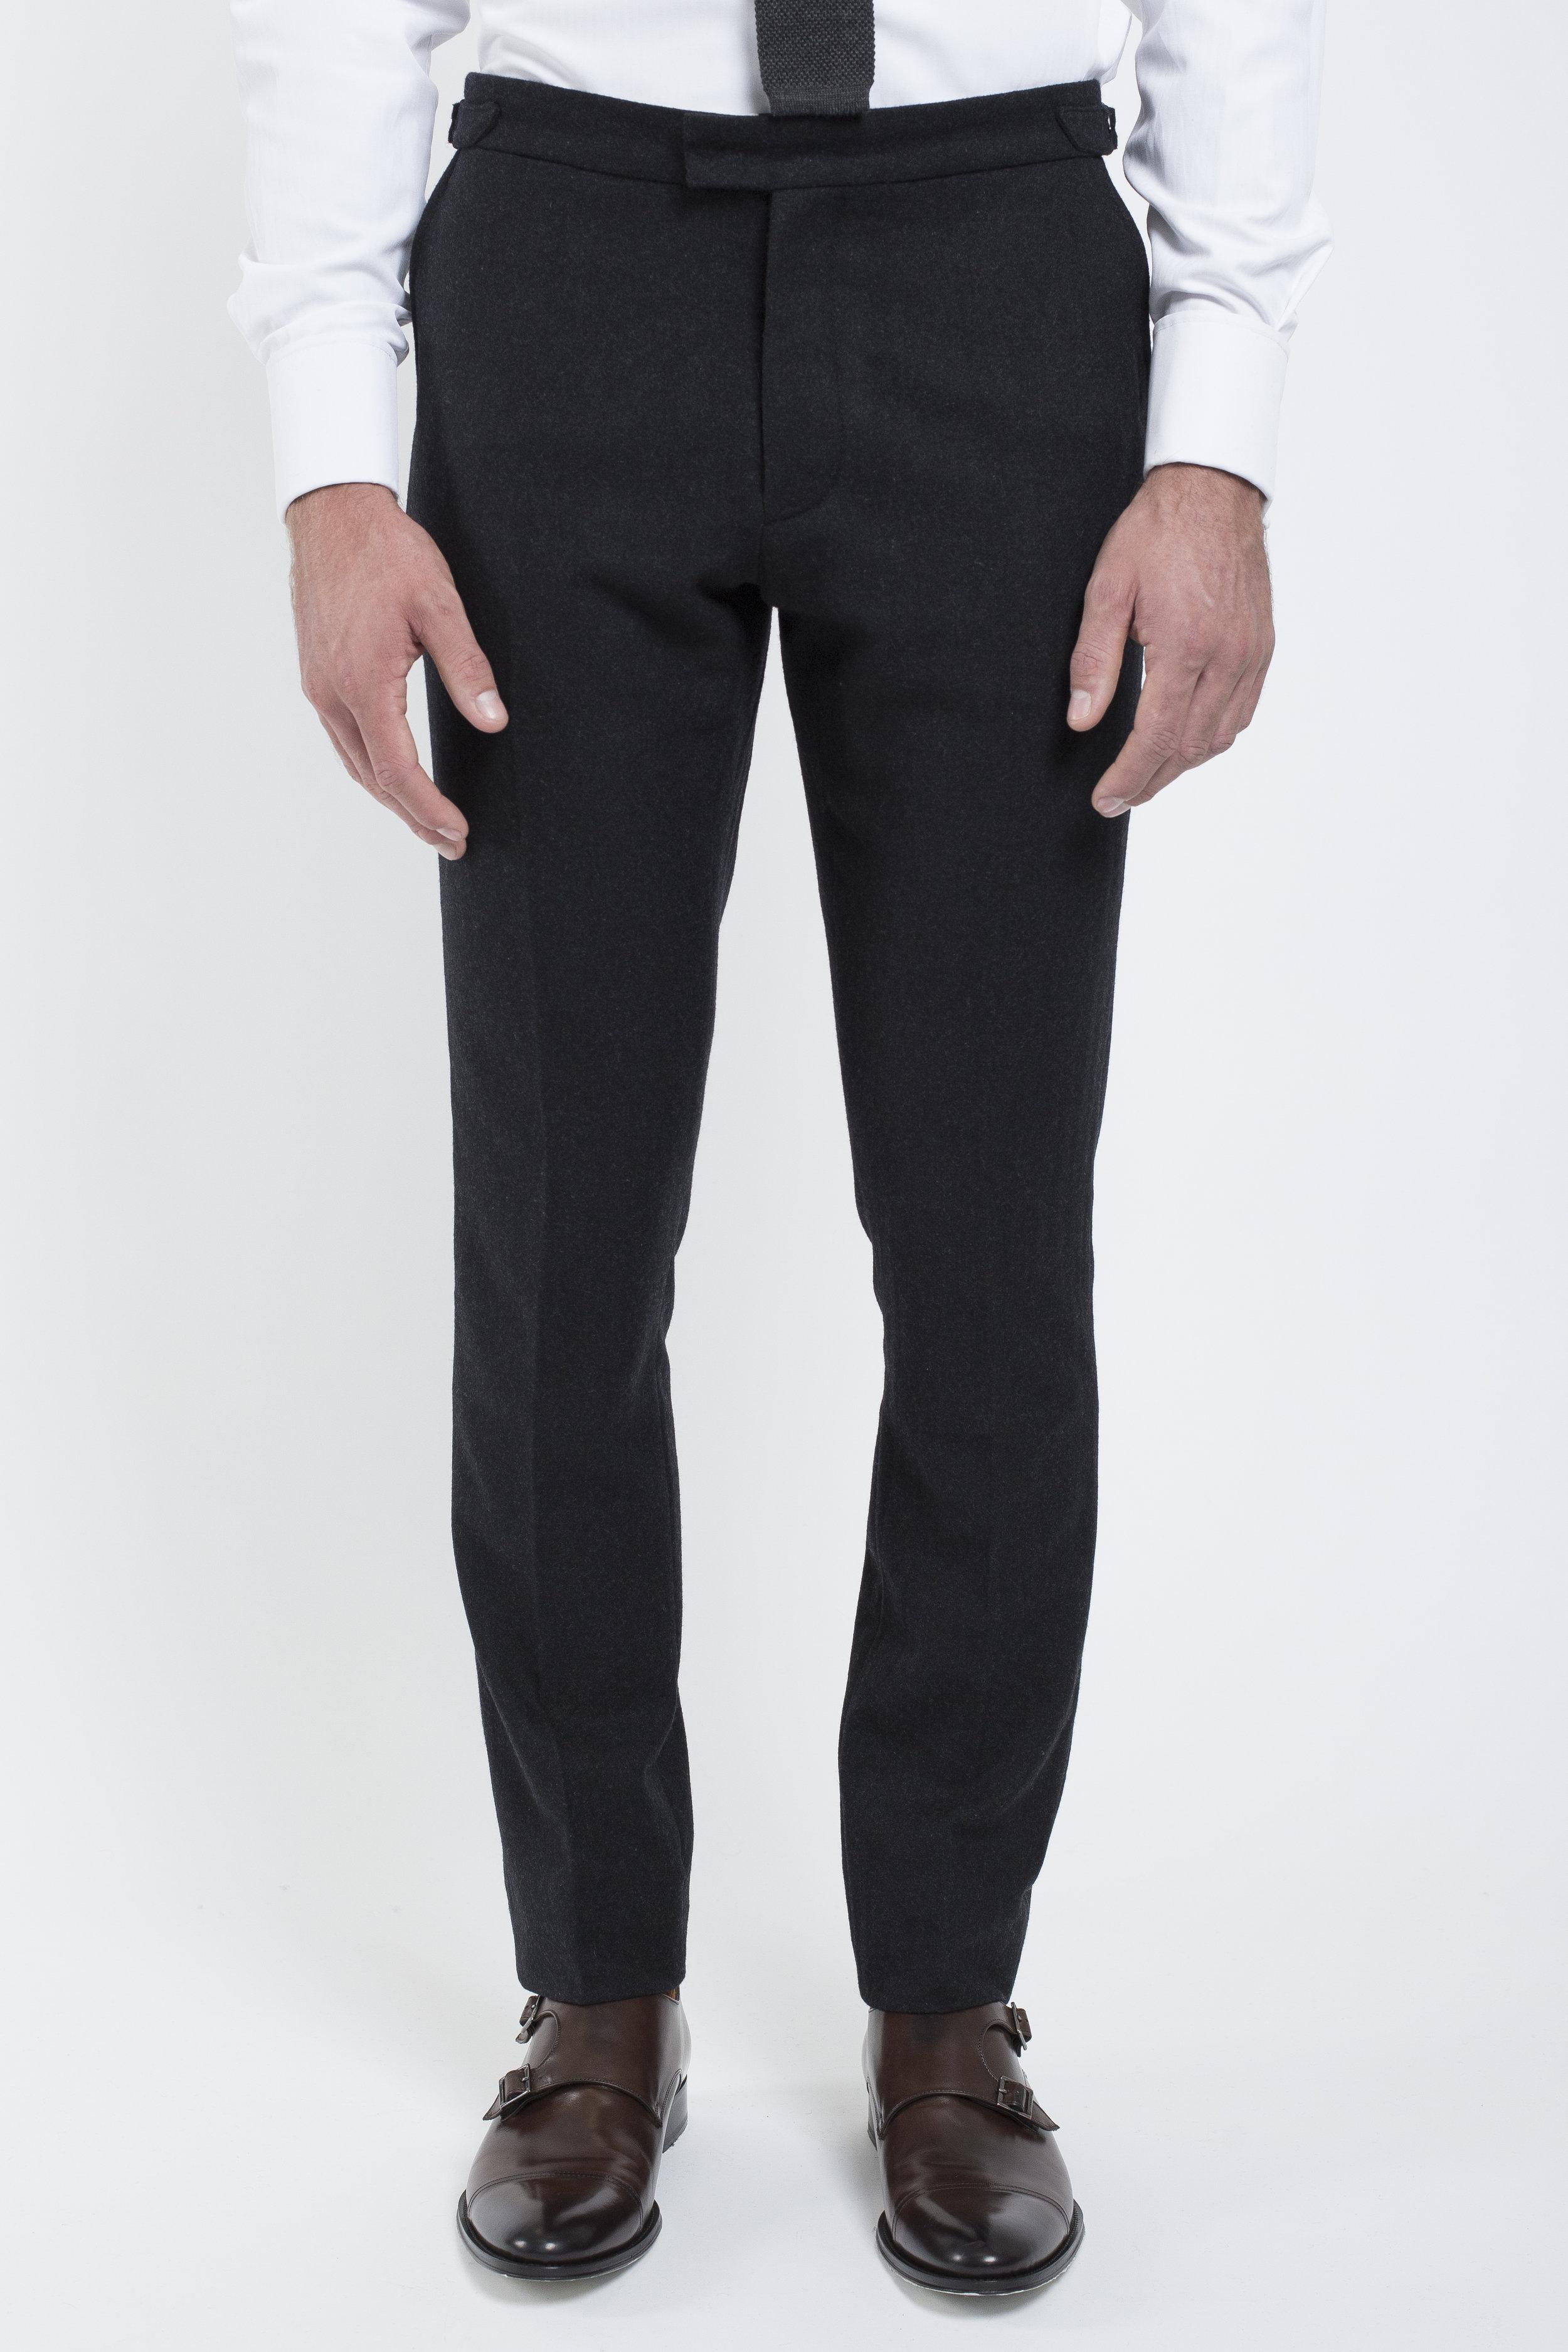 Lynch & Mason Milton Tailored Trousers.jpg